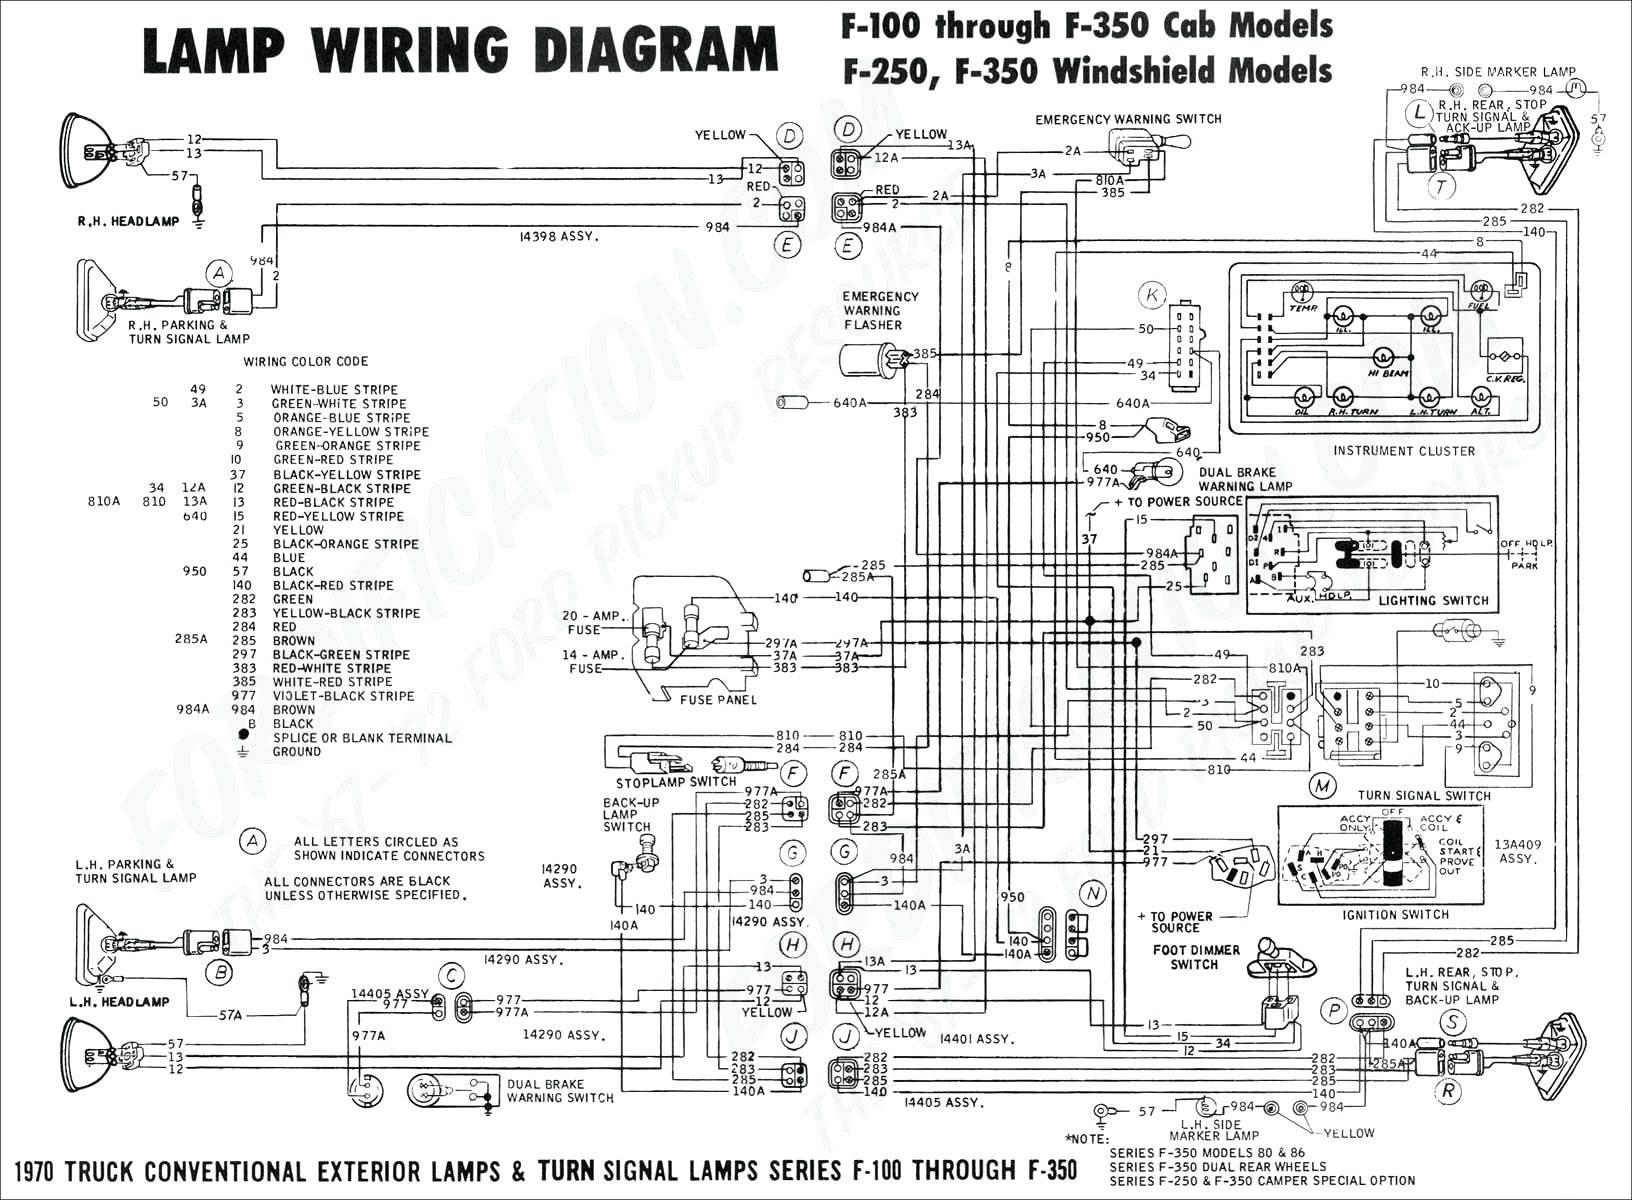 Fender S1 Switch Diagram Zw 2835] Brent Mason Guitar Wiring Diagram Http Of Fender S1 Switch Diagram